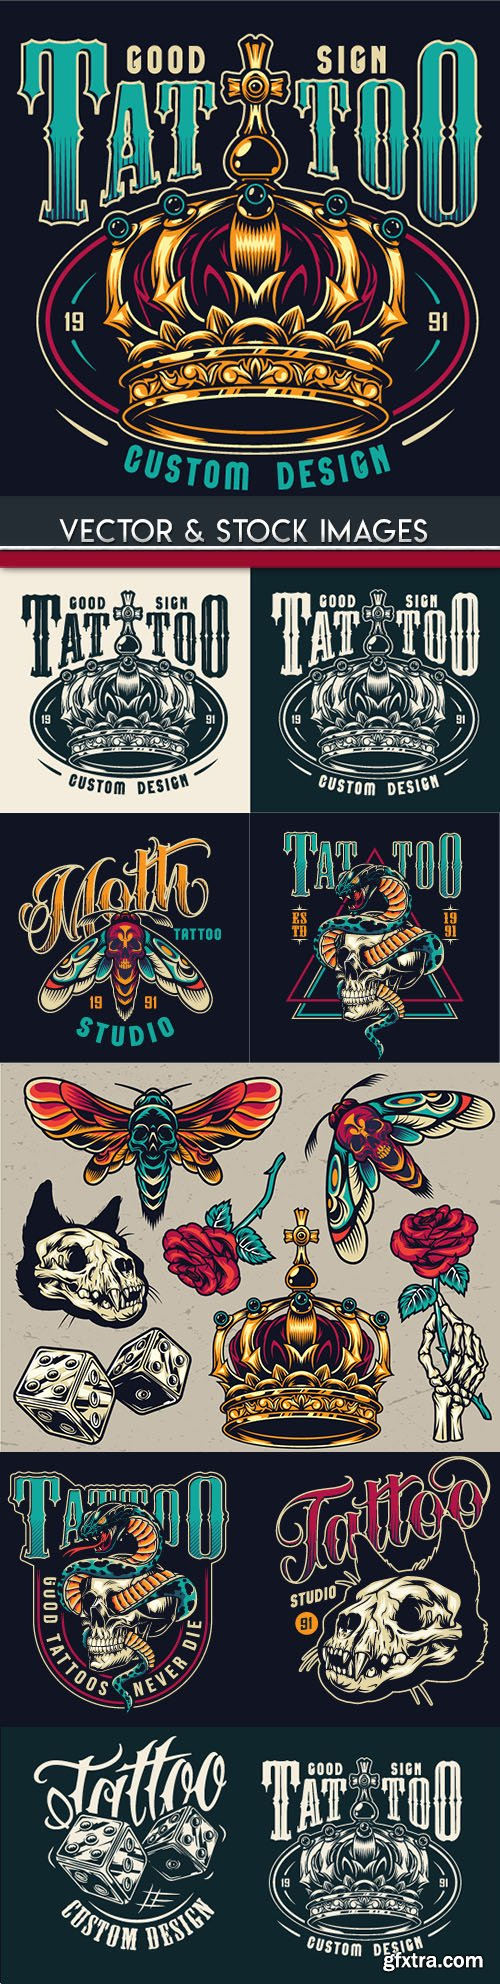 Tattoo design skull and accessories grunge label